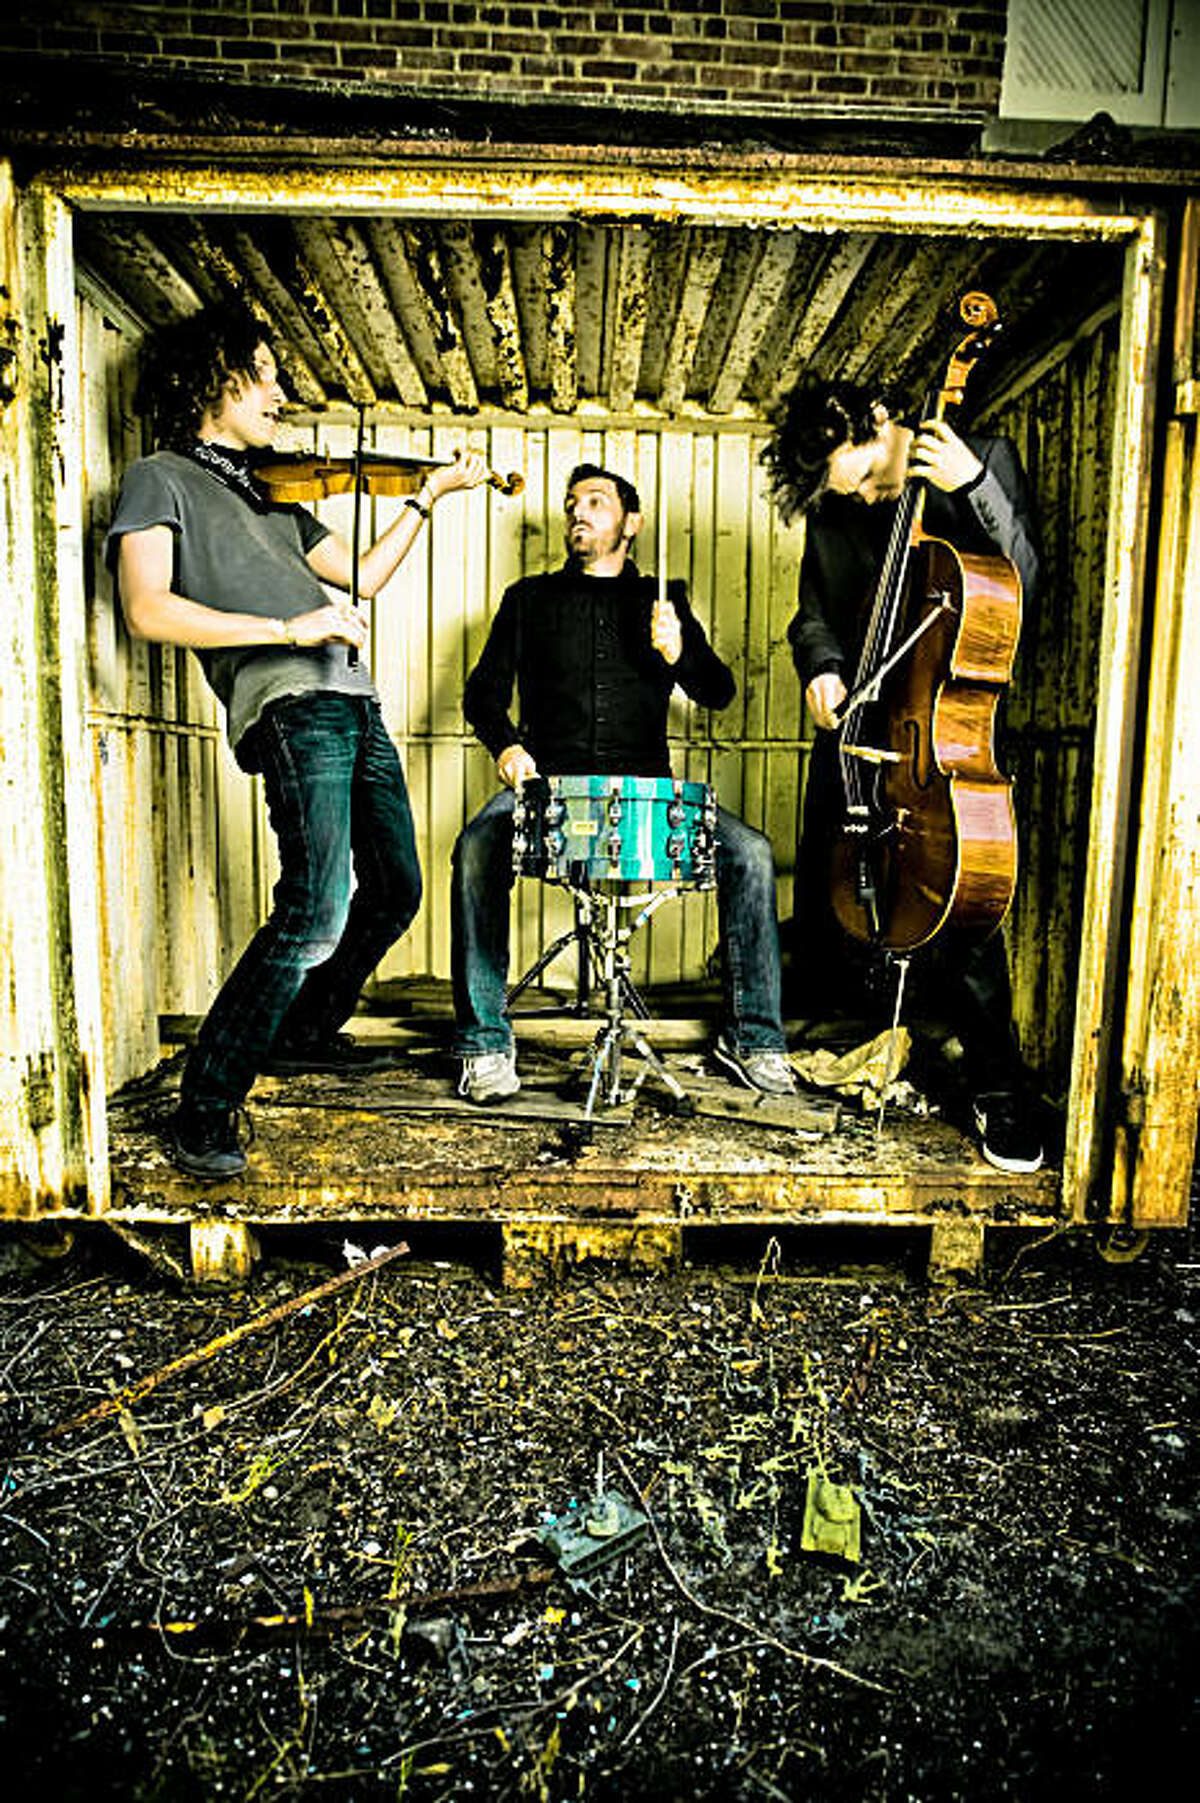 San Francisco string-metal band Judgement Day featuring (from left) Anton Patzner, Jon Bush and Lewis Patzner.